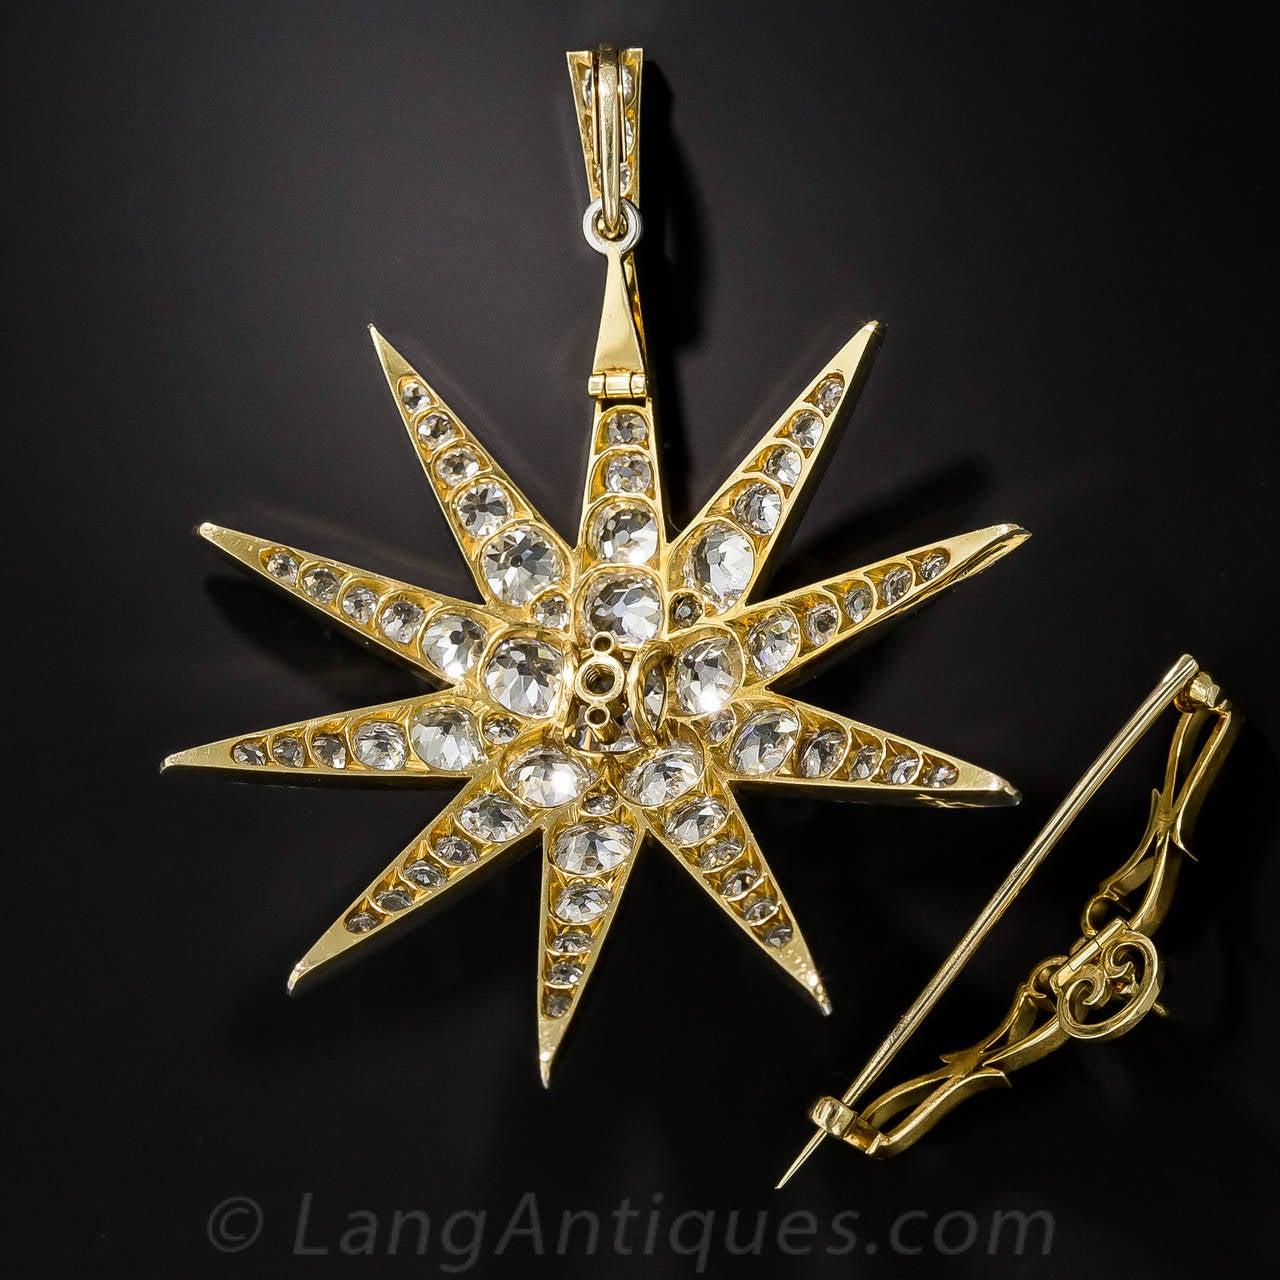 Women's or Men's Victorian 2.13 Carat Cushion Cut Diamond Platinum Star Brooch Pendant - GIA Cert For Sale